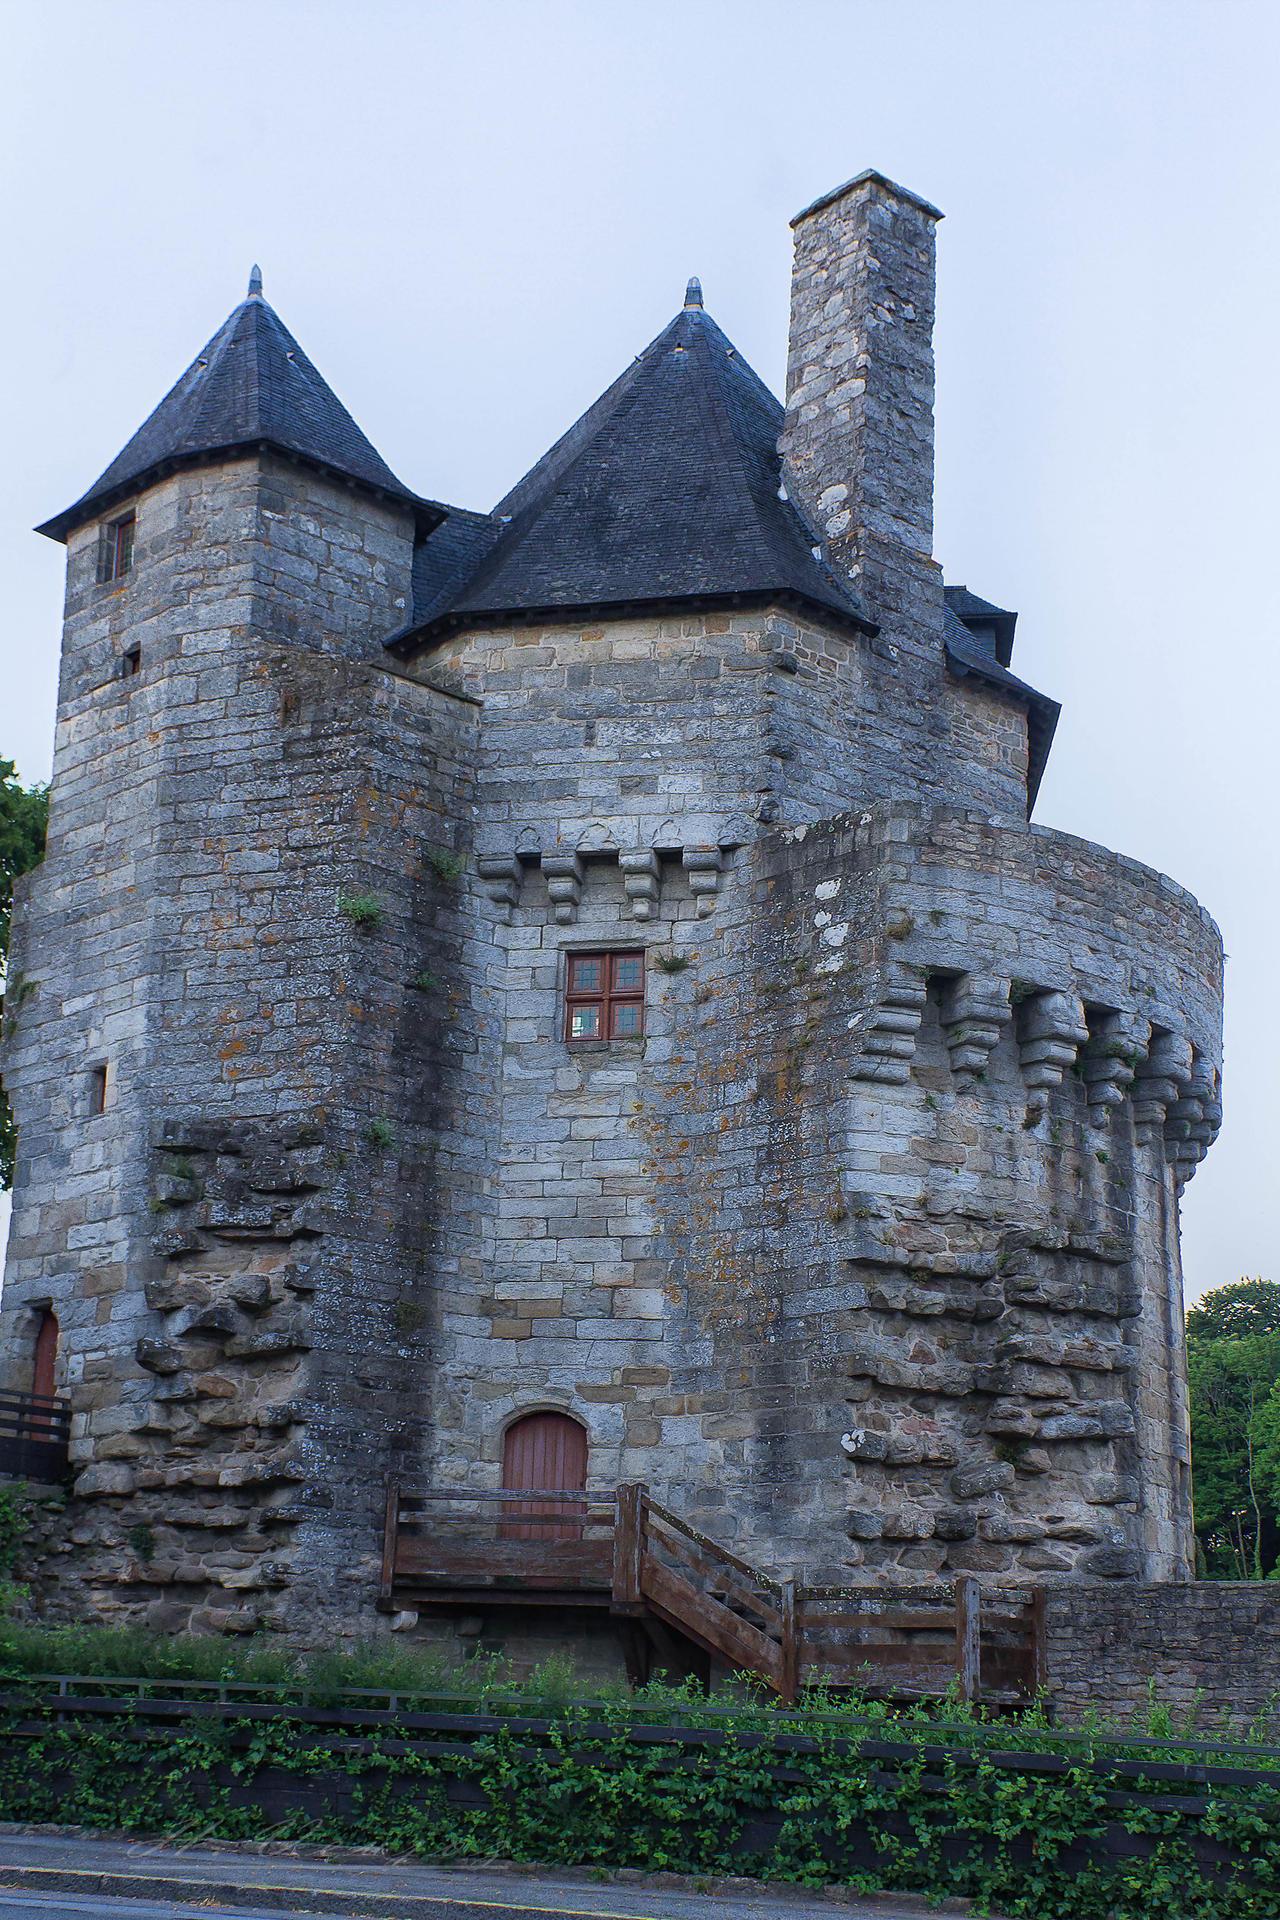 La Ville de Vannes2 Morbihan France by hubert61